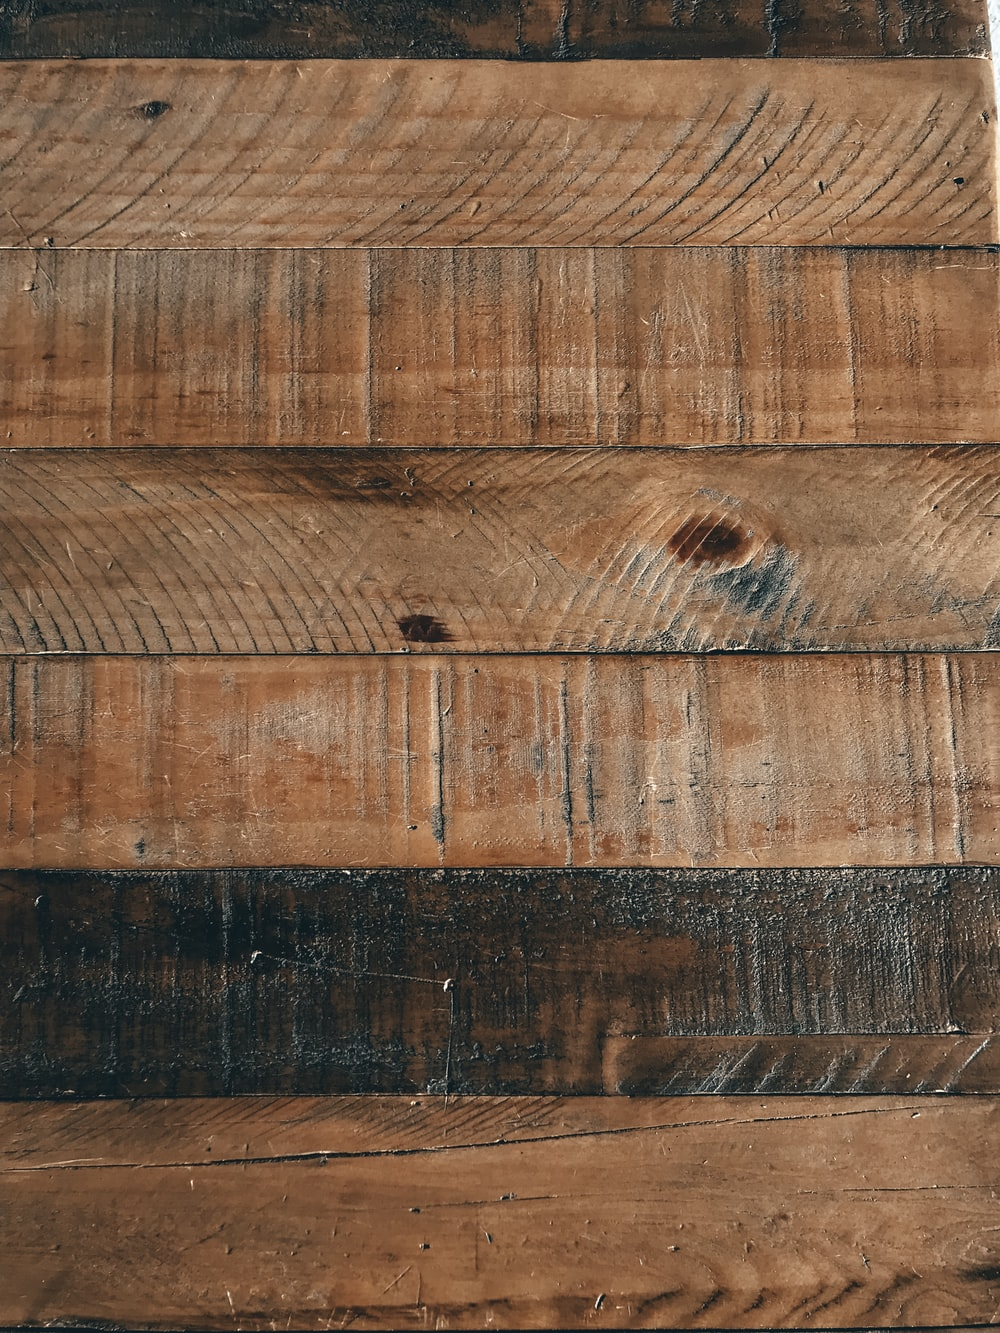 Wood Hardwood Lumber And Plywood Hd Photo By Jan